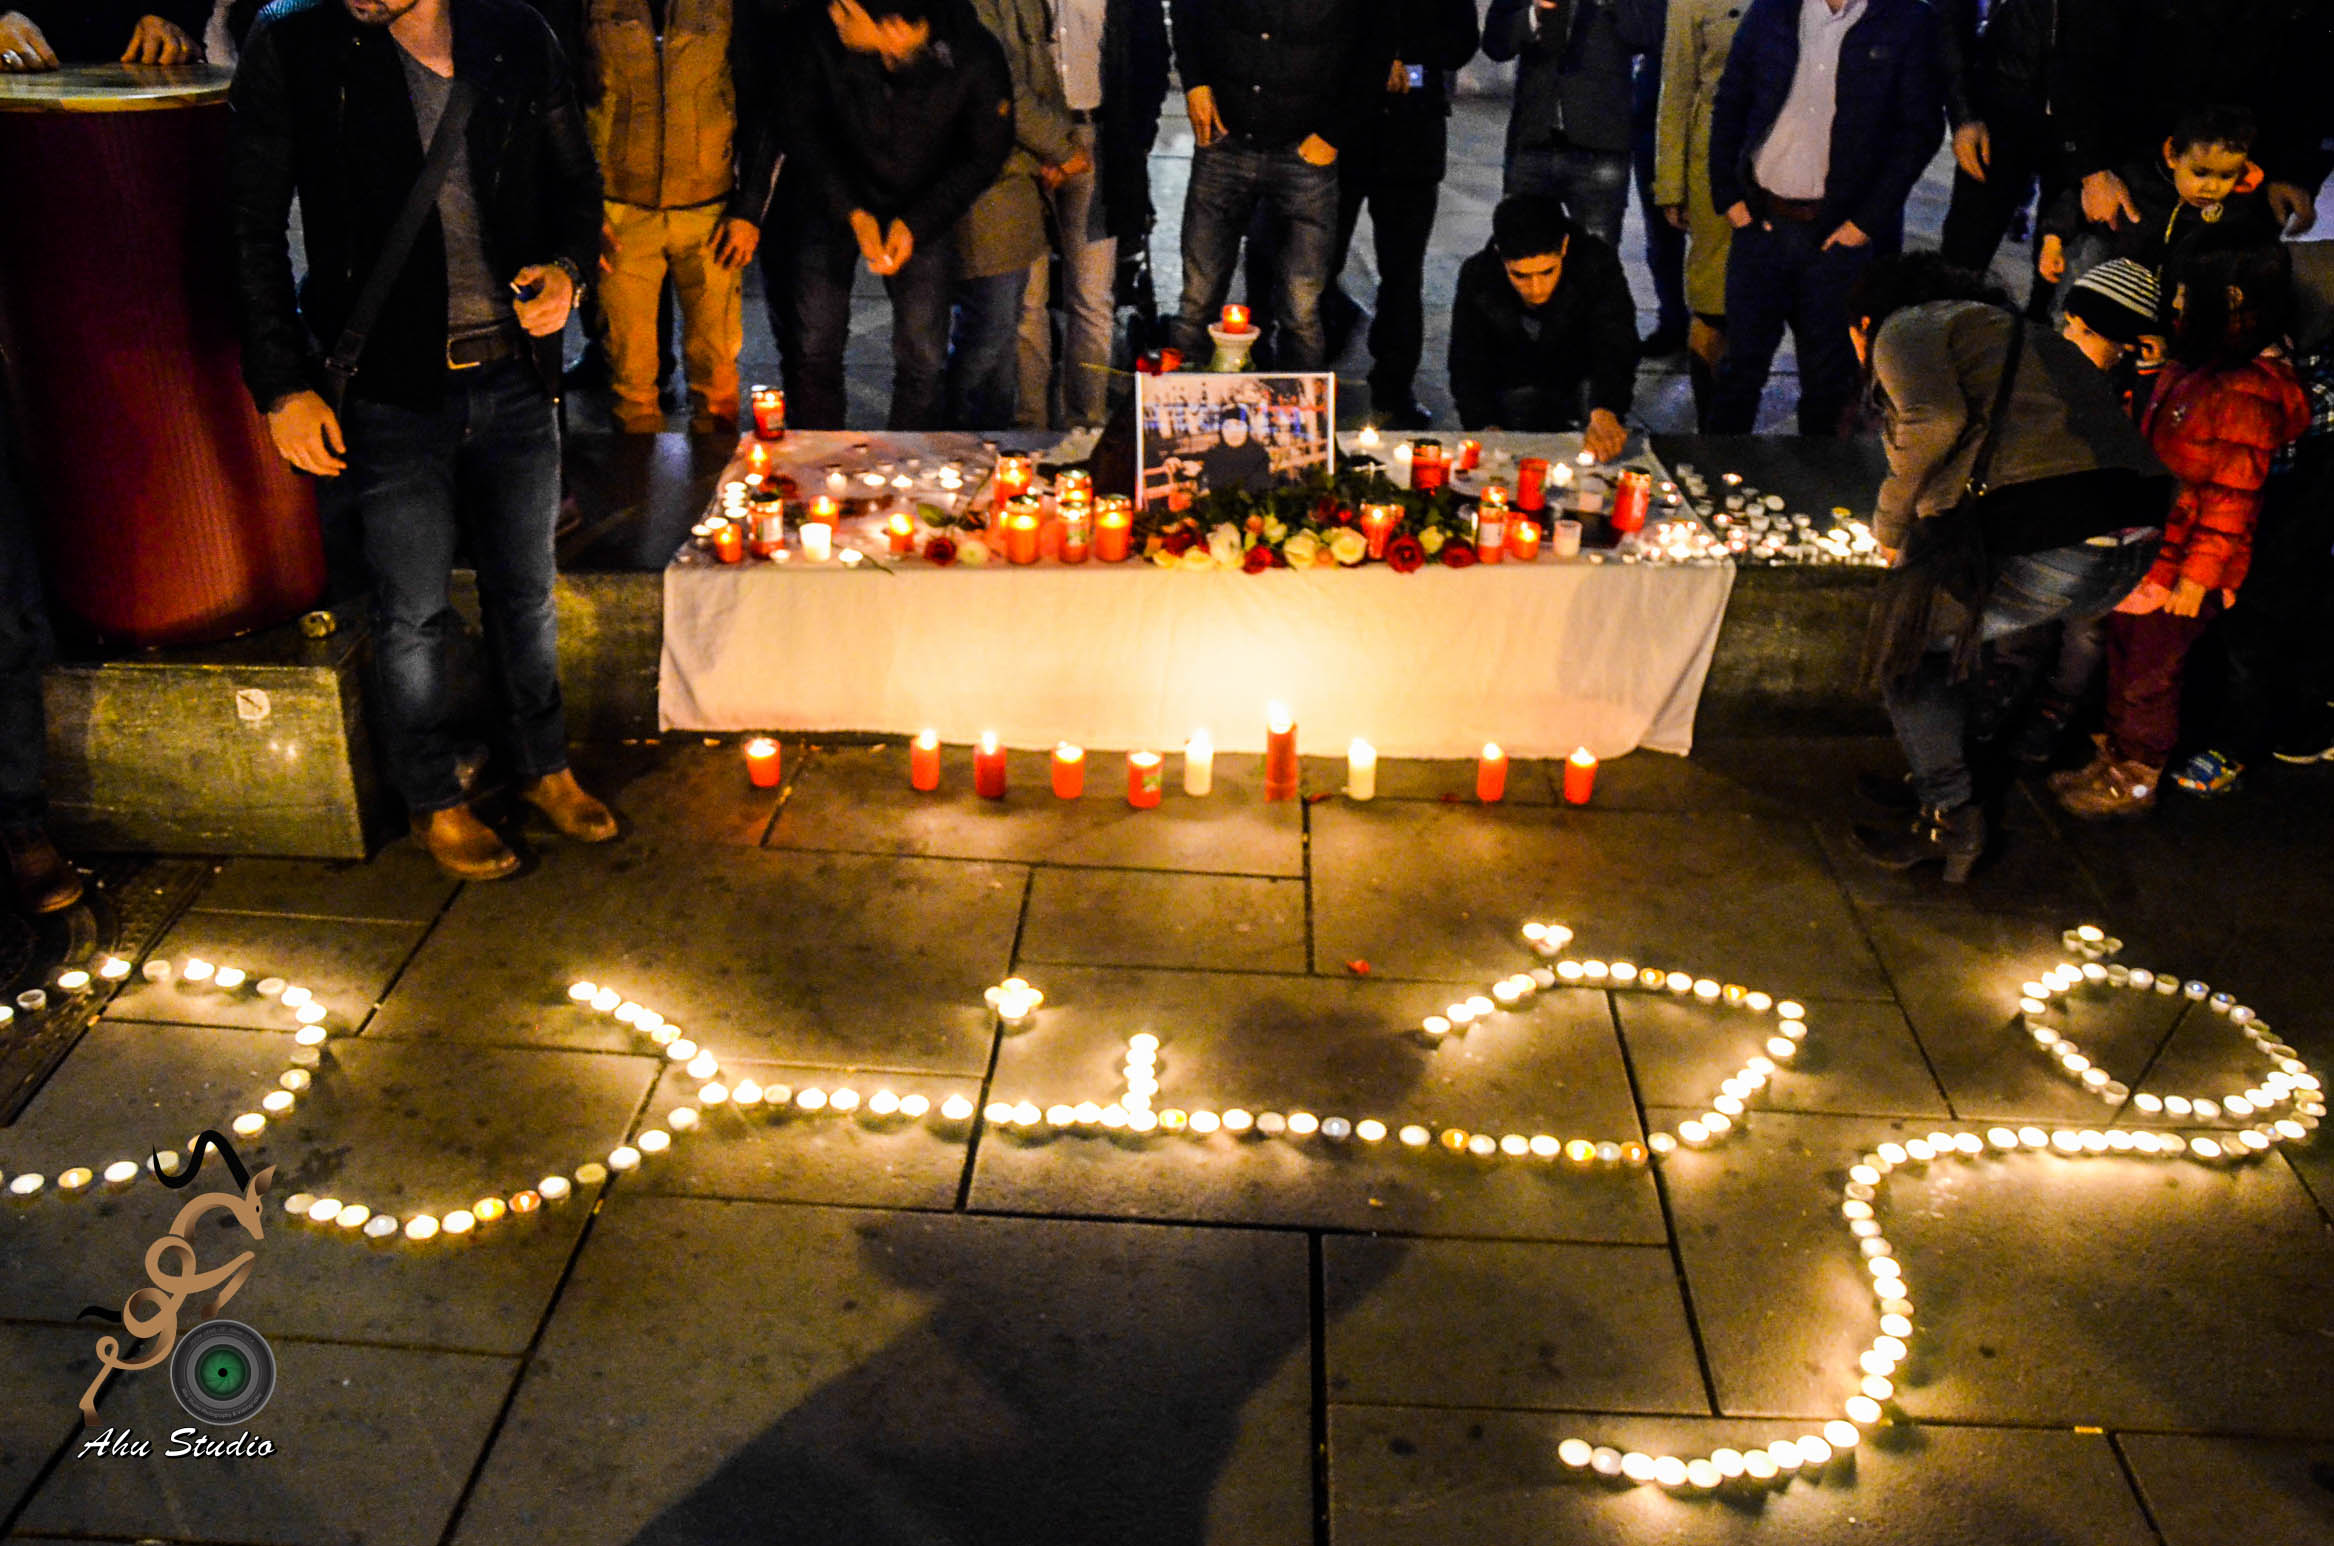 Gedenkfeier zu Farkhundas Mord, Foto: Murtaza Muhamadi